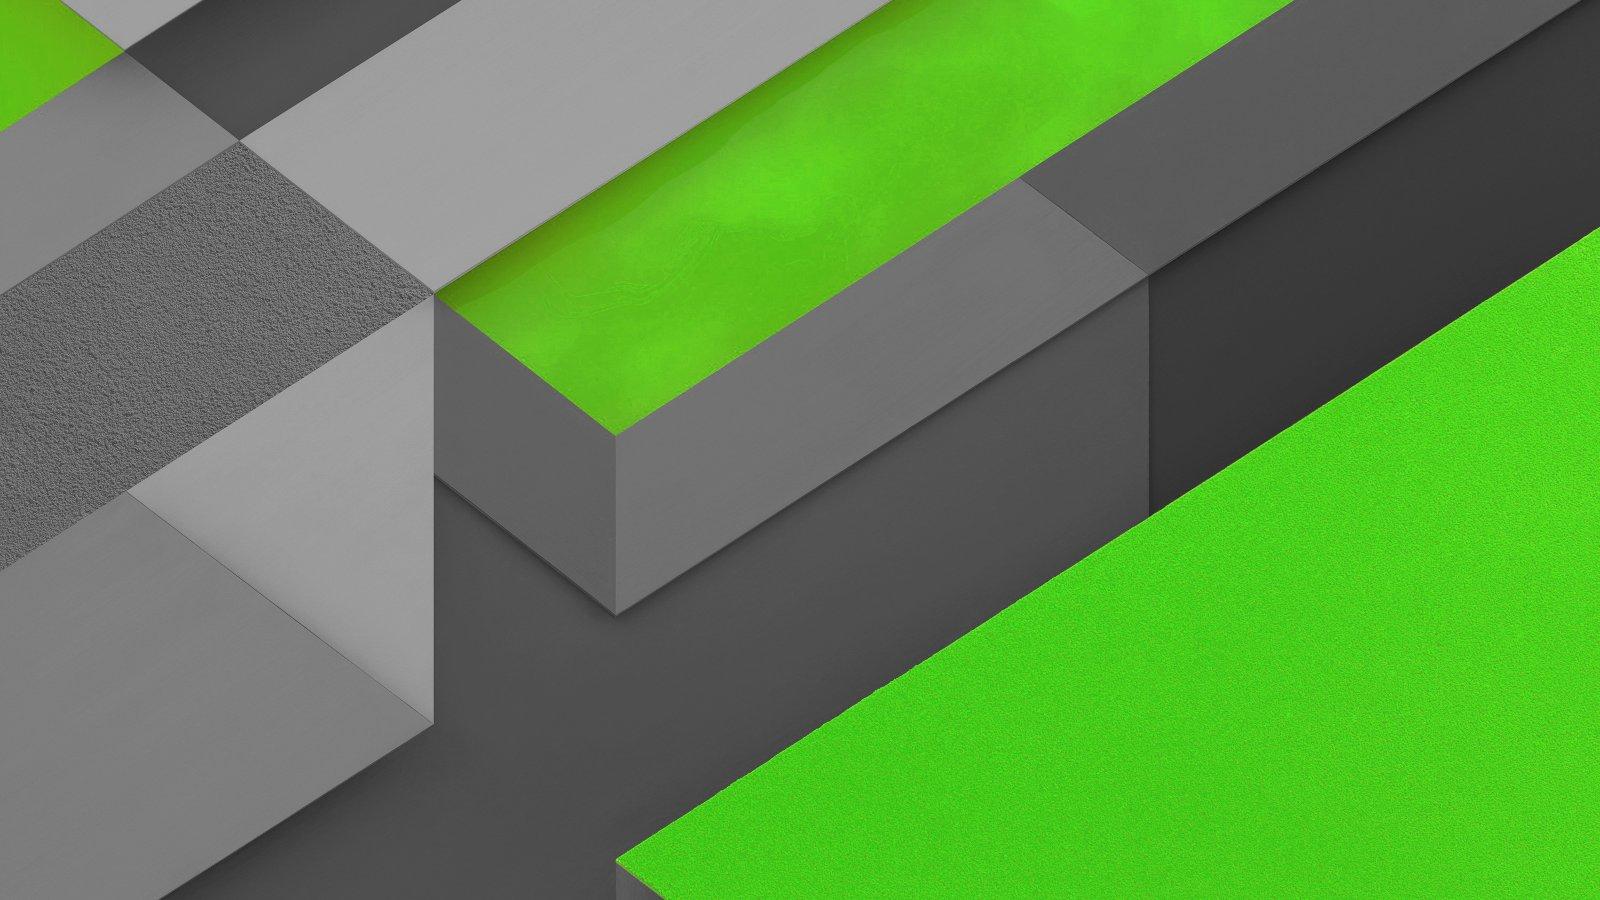 How to manually install nokia 6 android 8. 1 oreo update (ota).